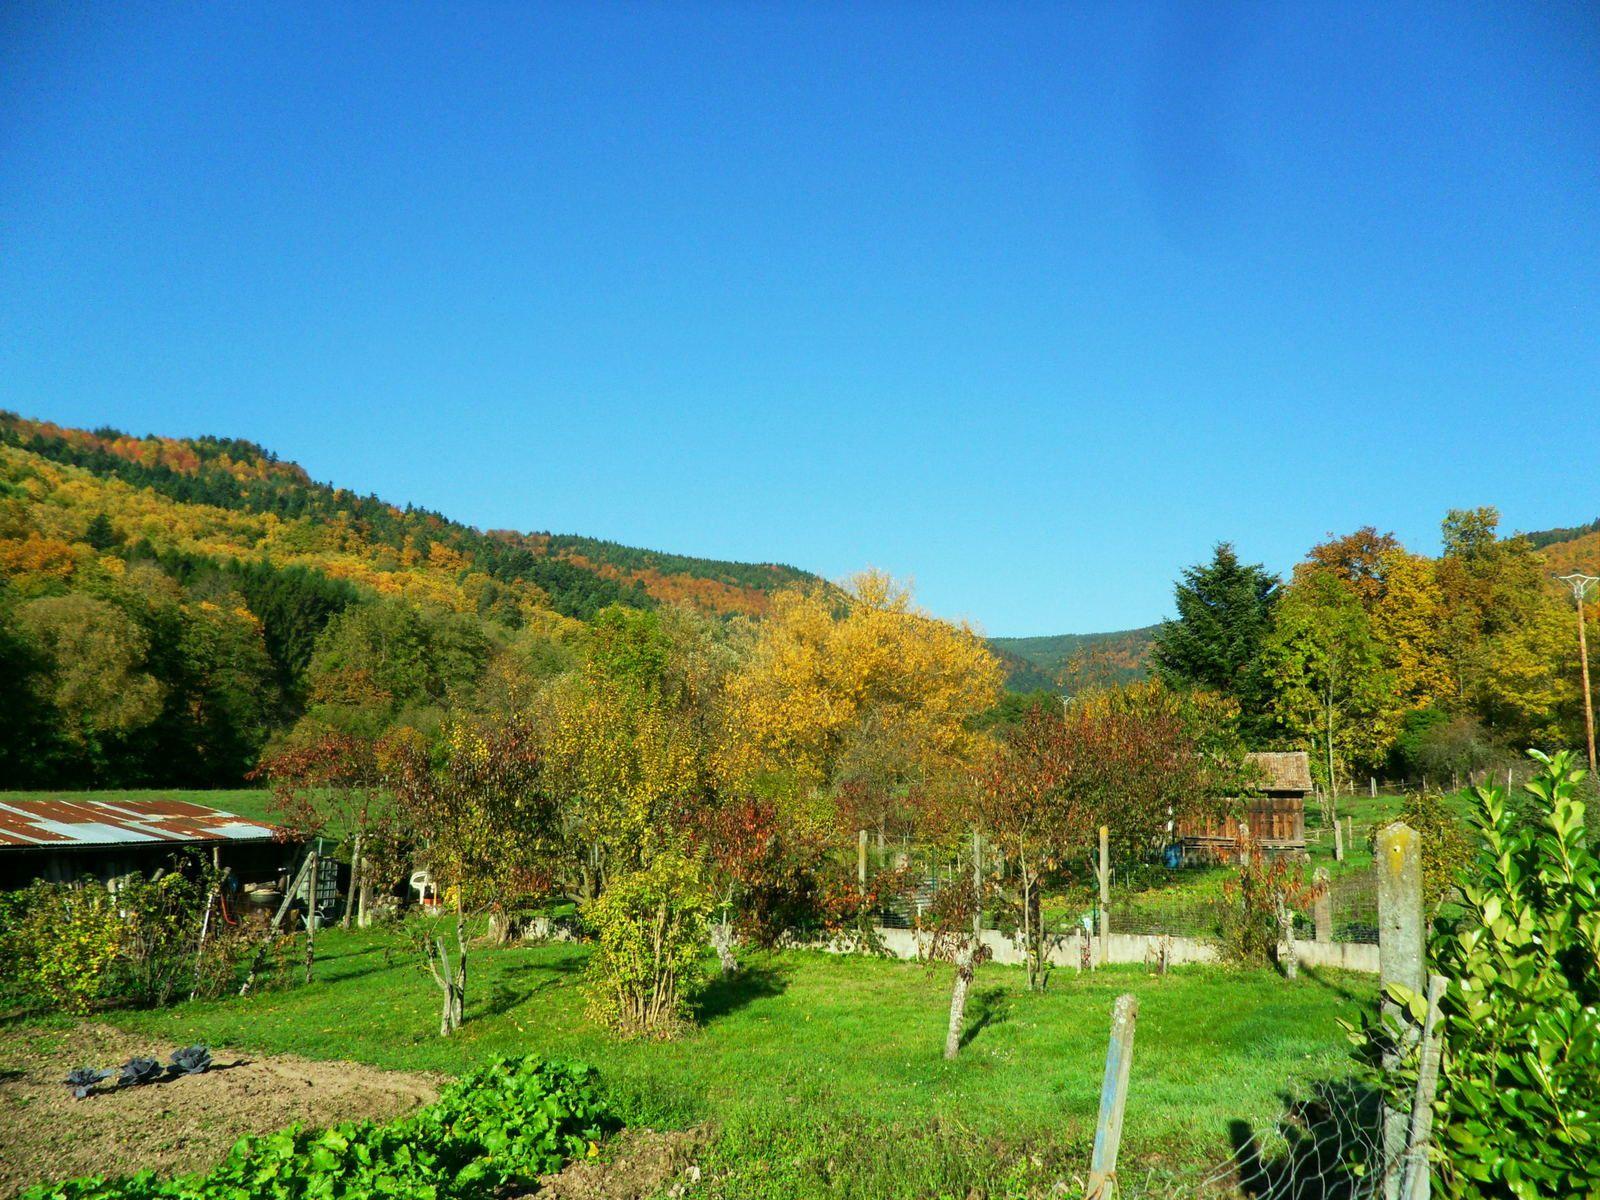 Mercredi 4 novembre - Randonnée de Wihr-au-Val à Gunsbach